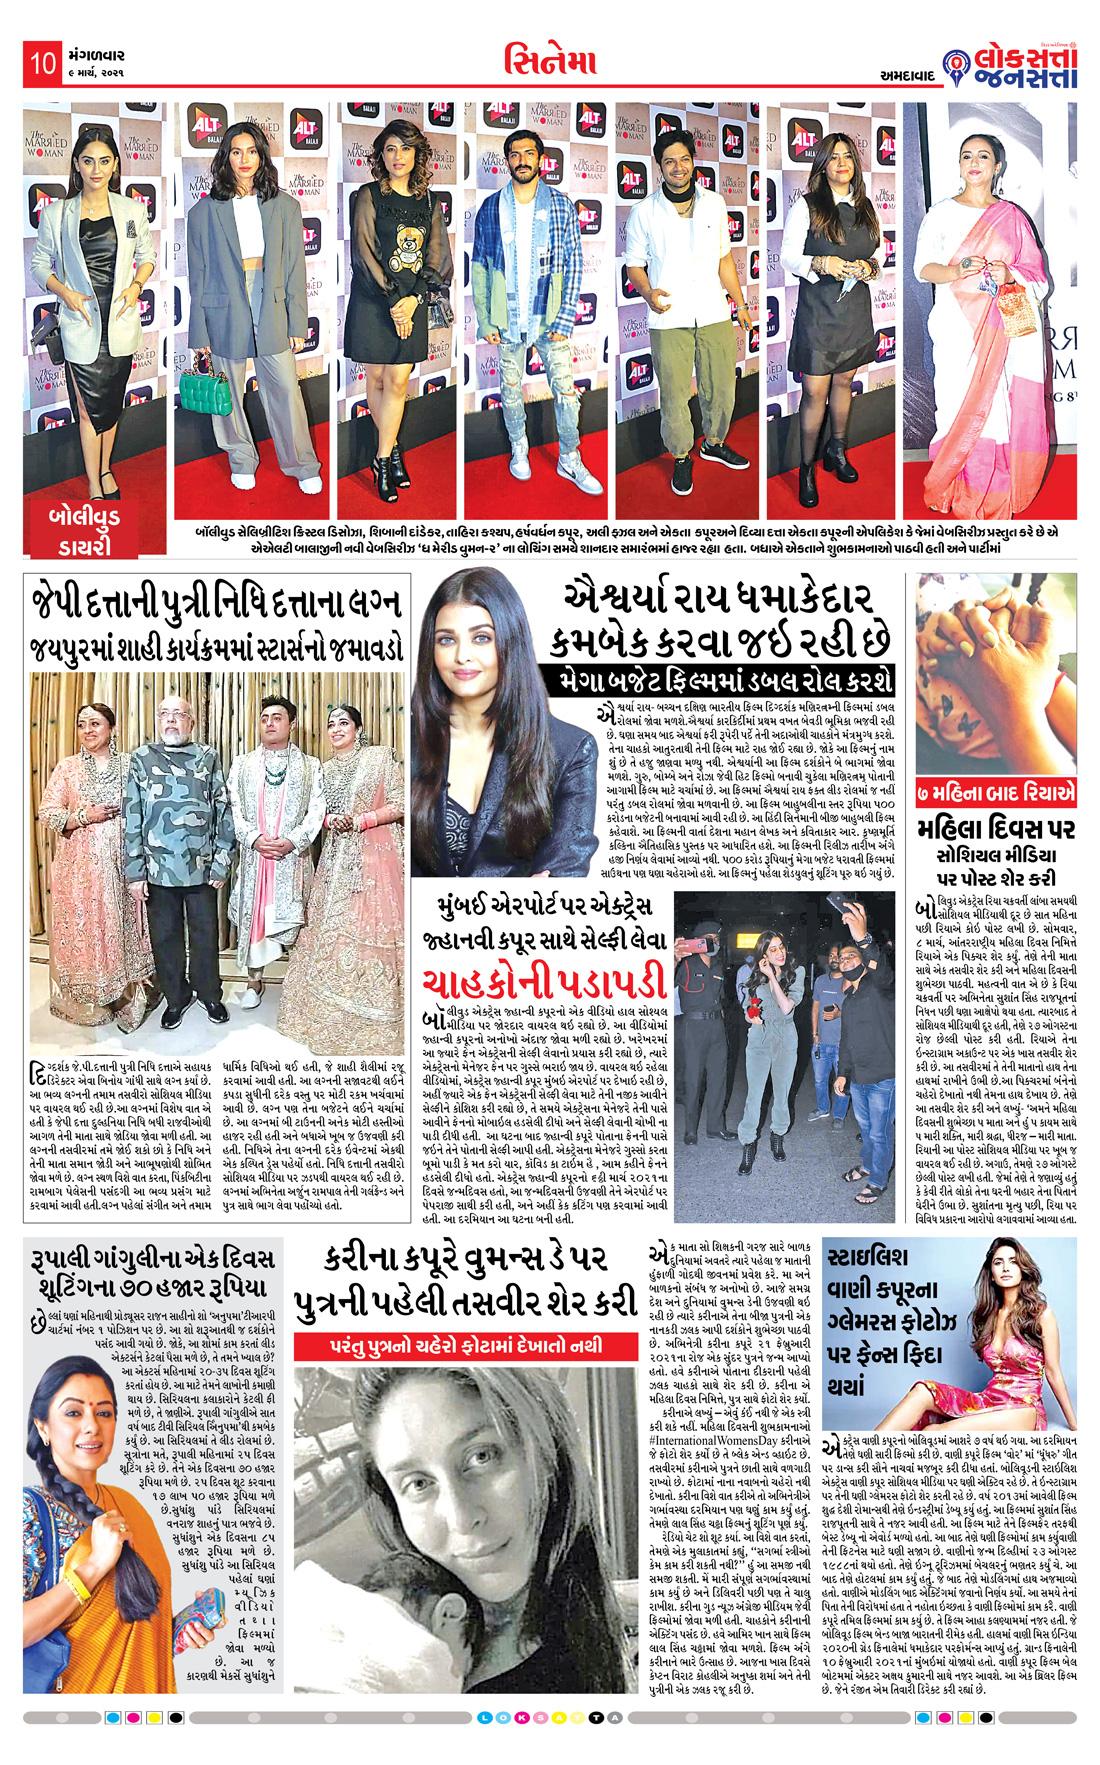 Loksatta Jansatta News Papaer E-paper dated 2021-03-09 | Page 11